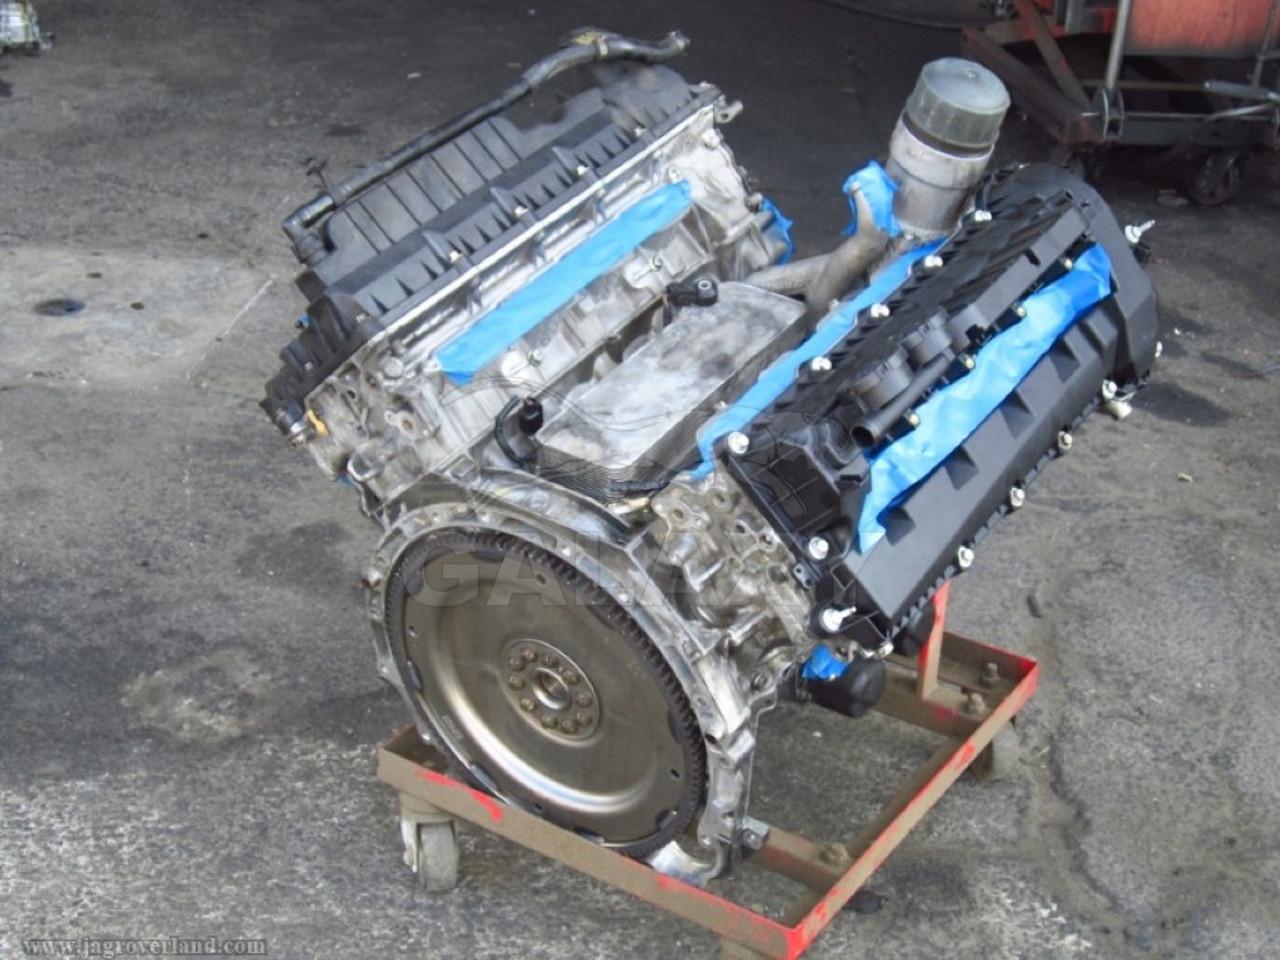 Rebuilt Jaguar Supercharged Engine 10 15 Xj L Xk Xf R 5 0l C2d49713 Galaxy Jaguar